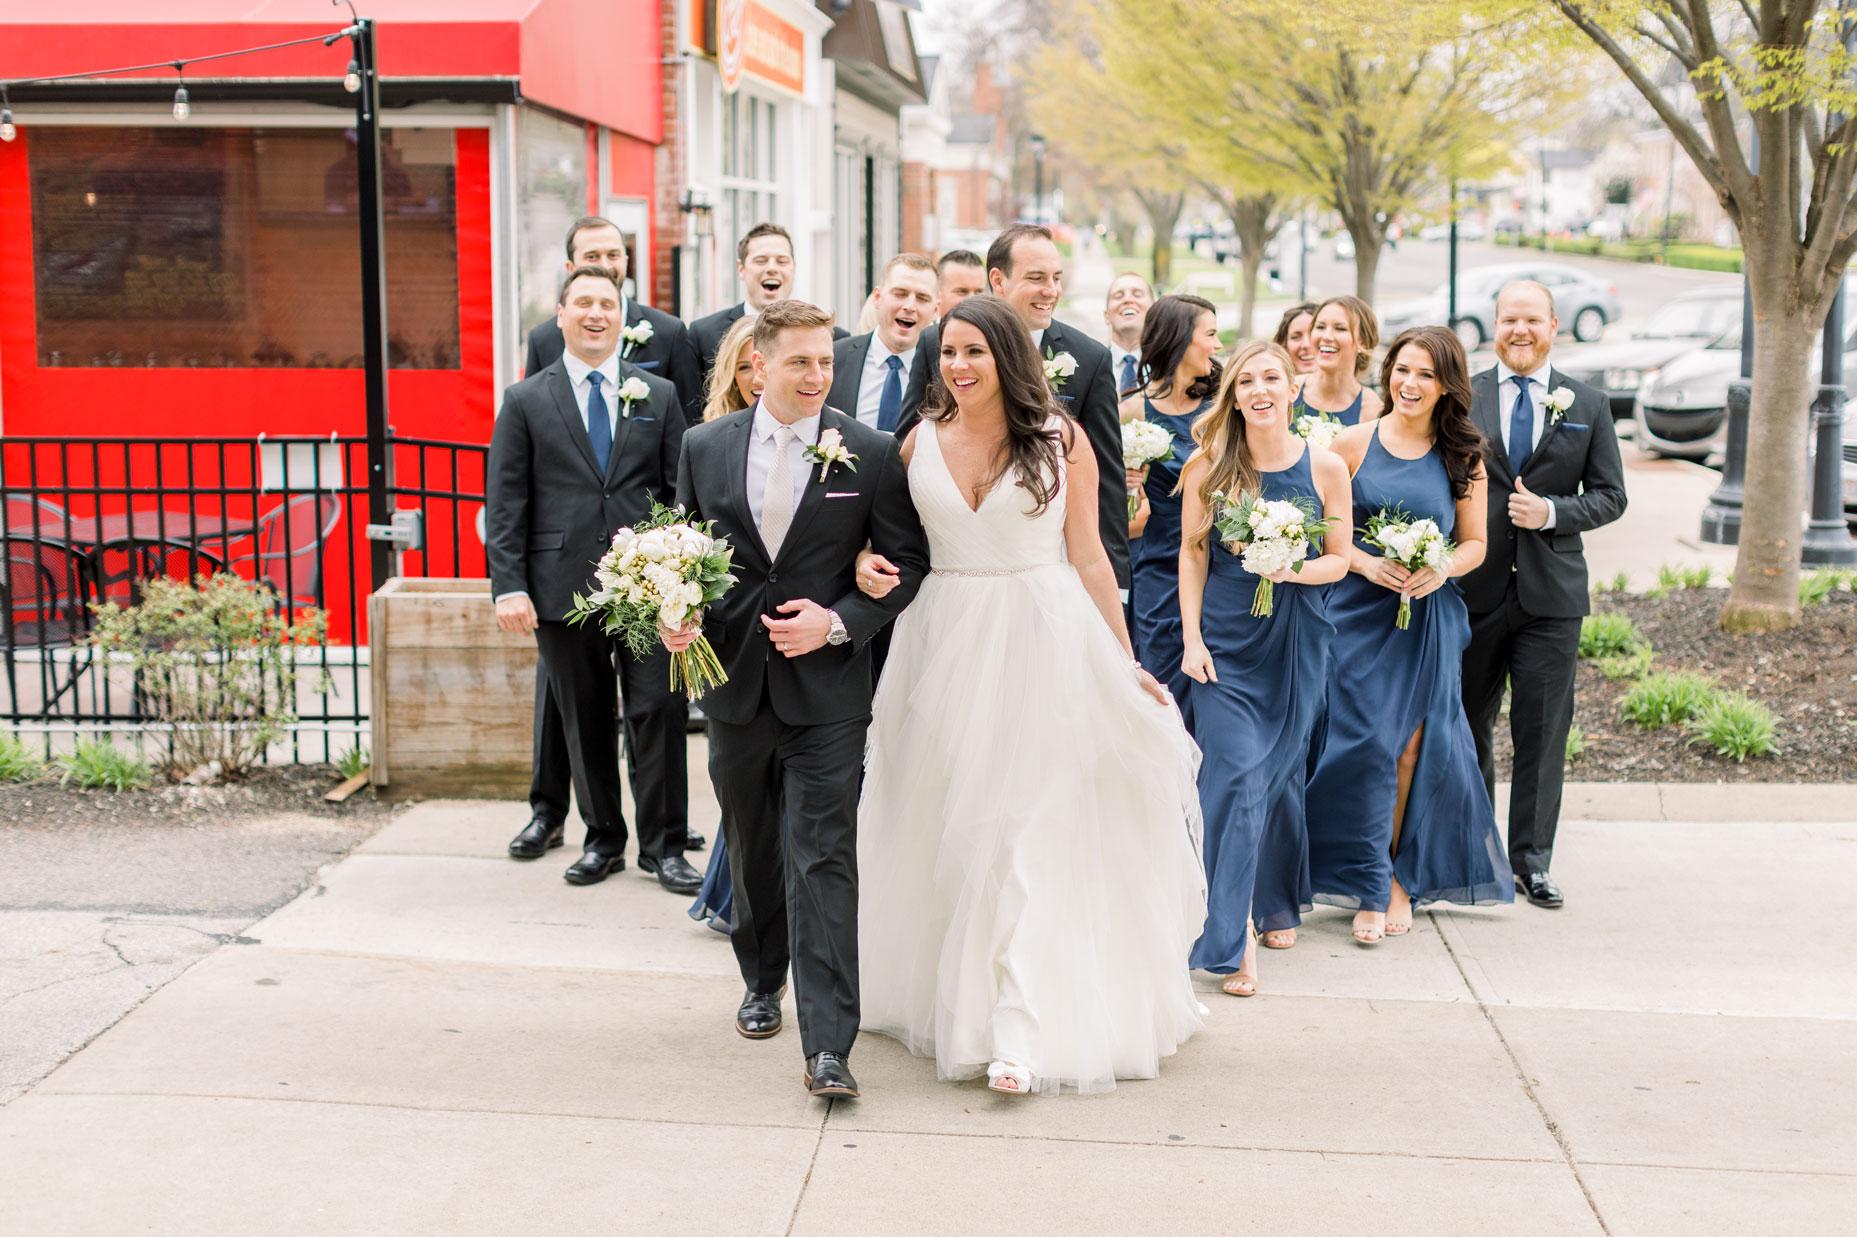 Konz-Bigaila-wedding-2017-66.jpg